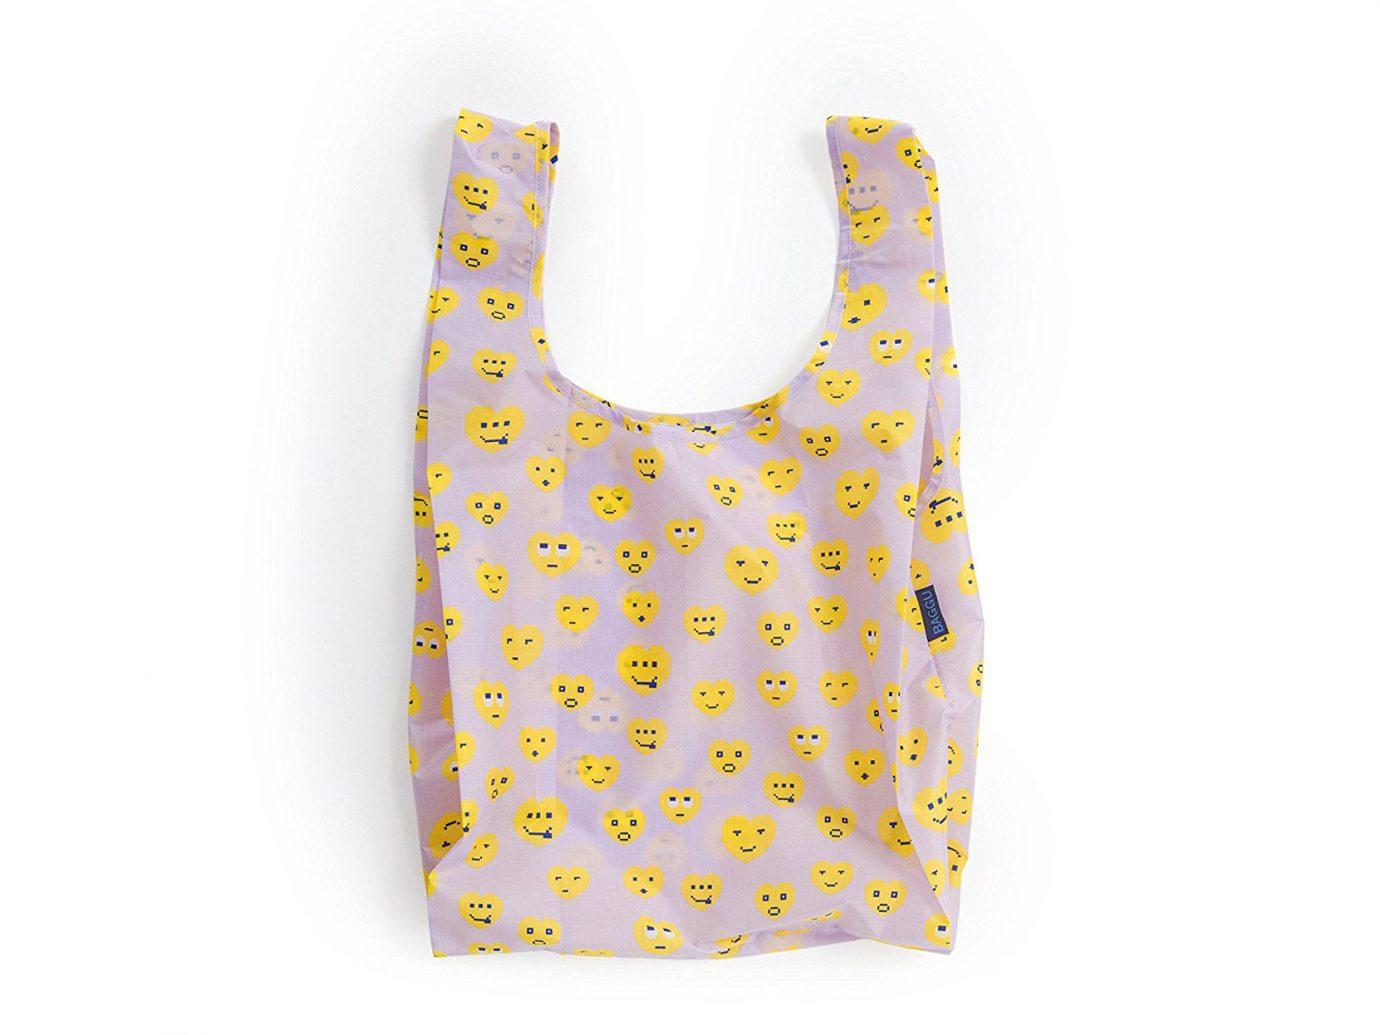 Packing Tips Solo Travel Travel Shop Travel Tips white clothing yellow product pattern Design bib font handbag